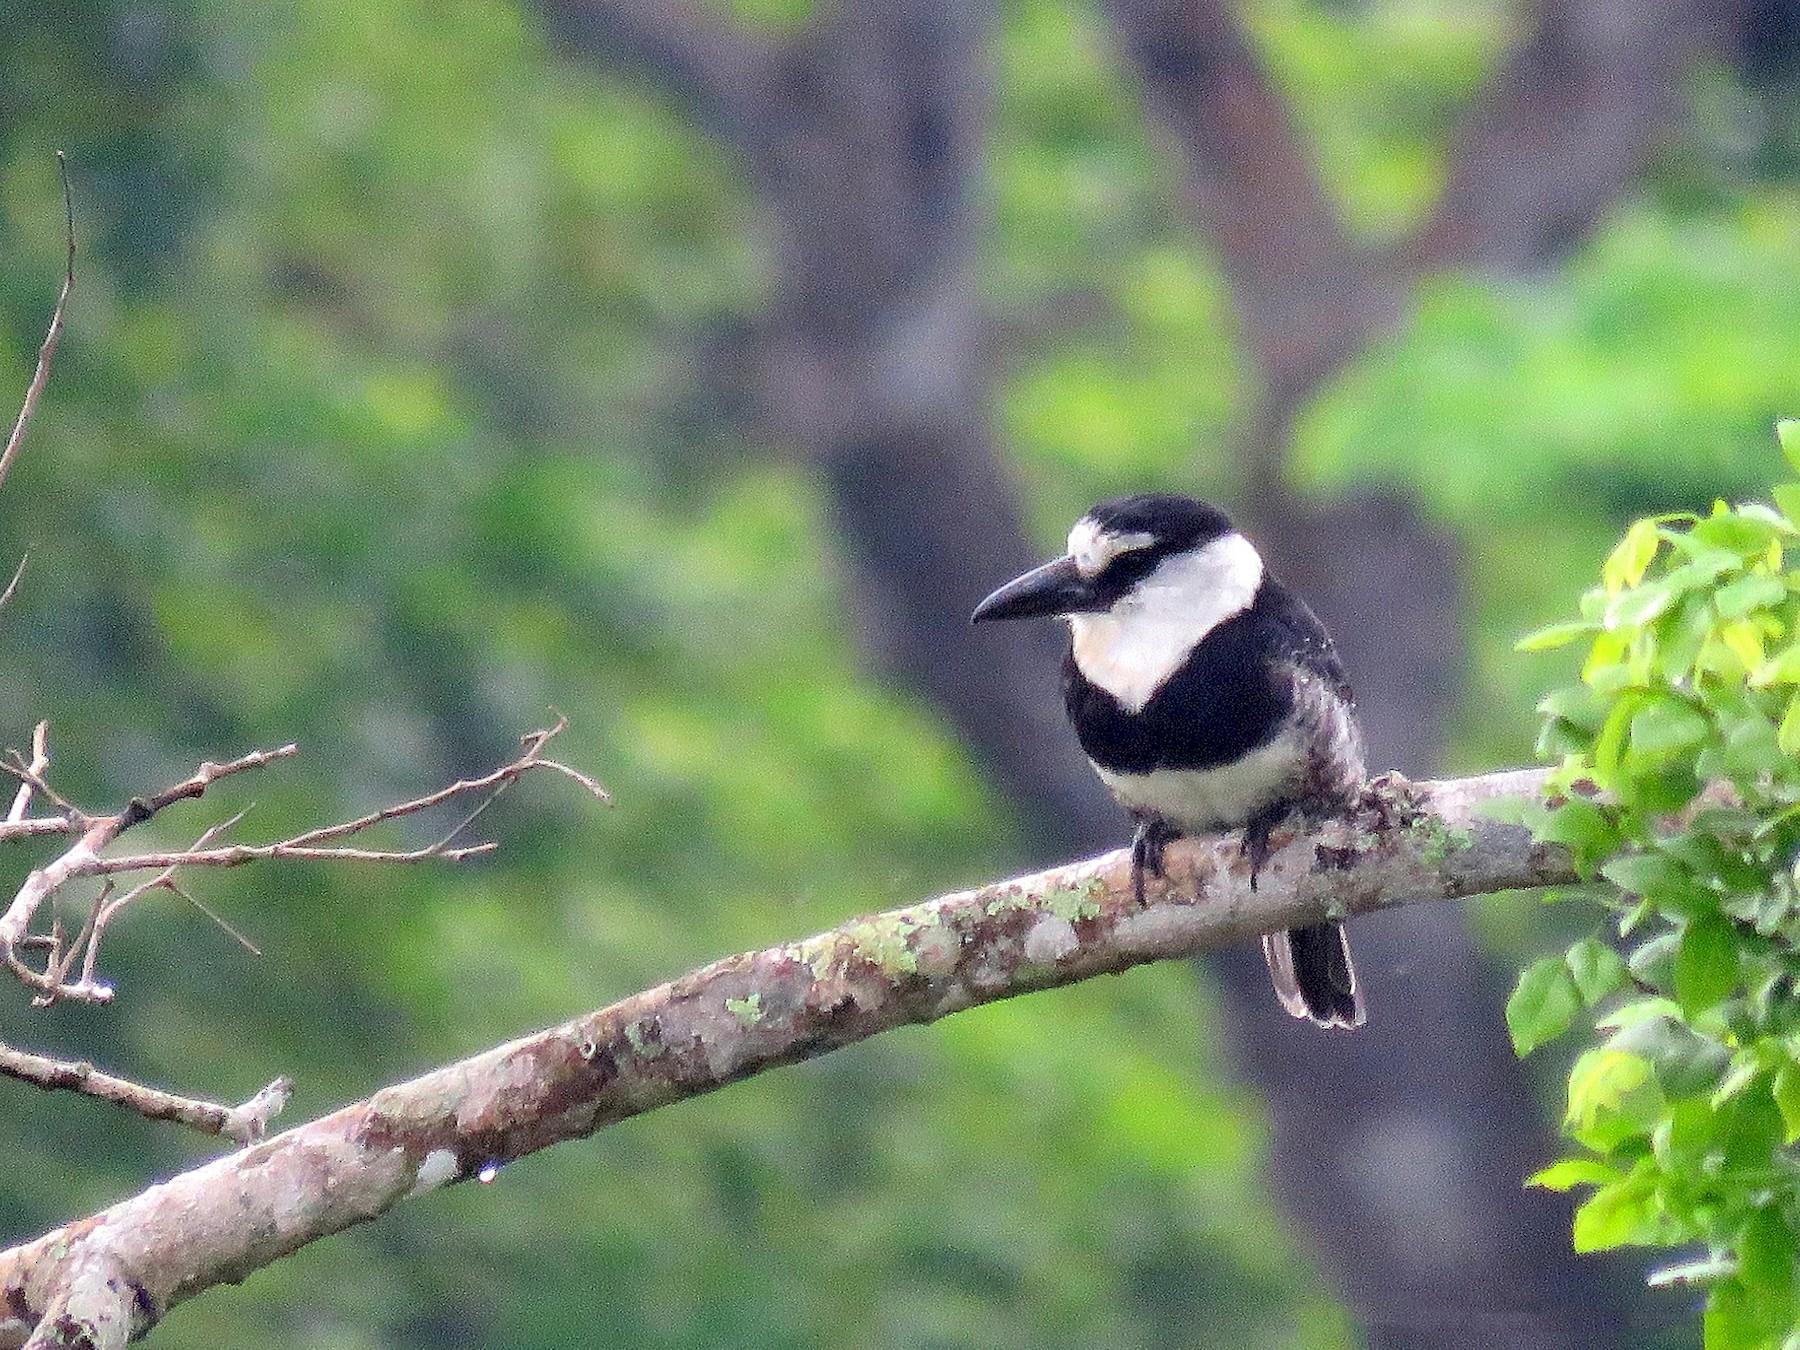 White-necked Puffbird - Rolando Jordan